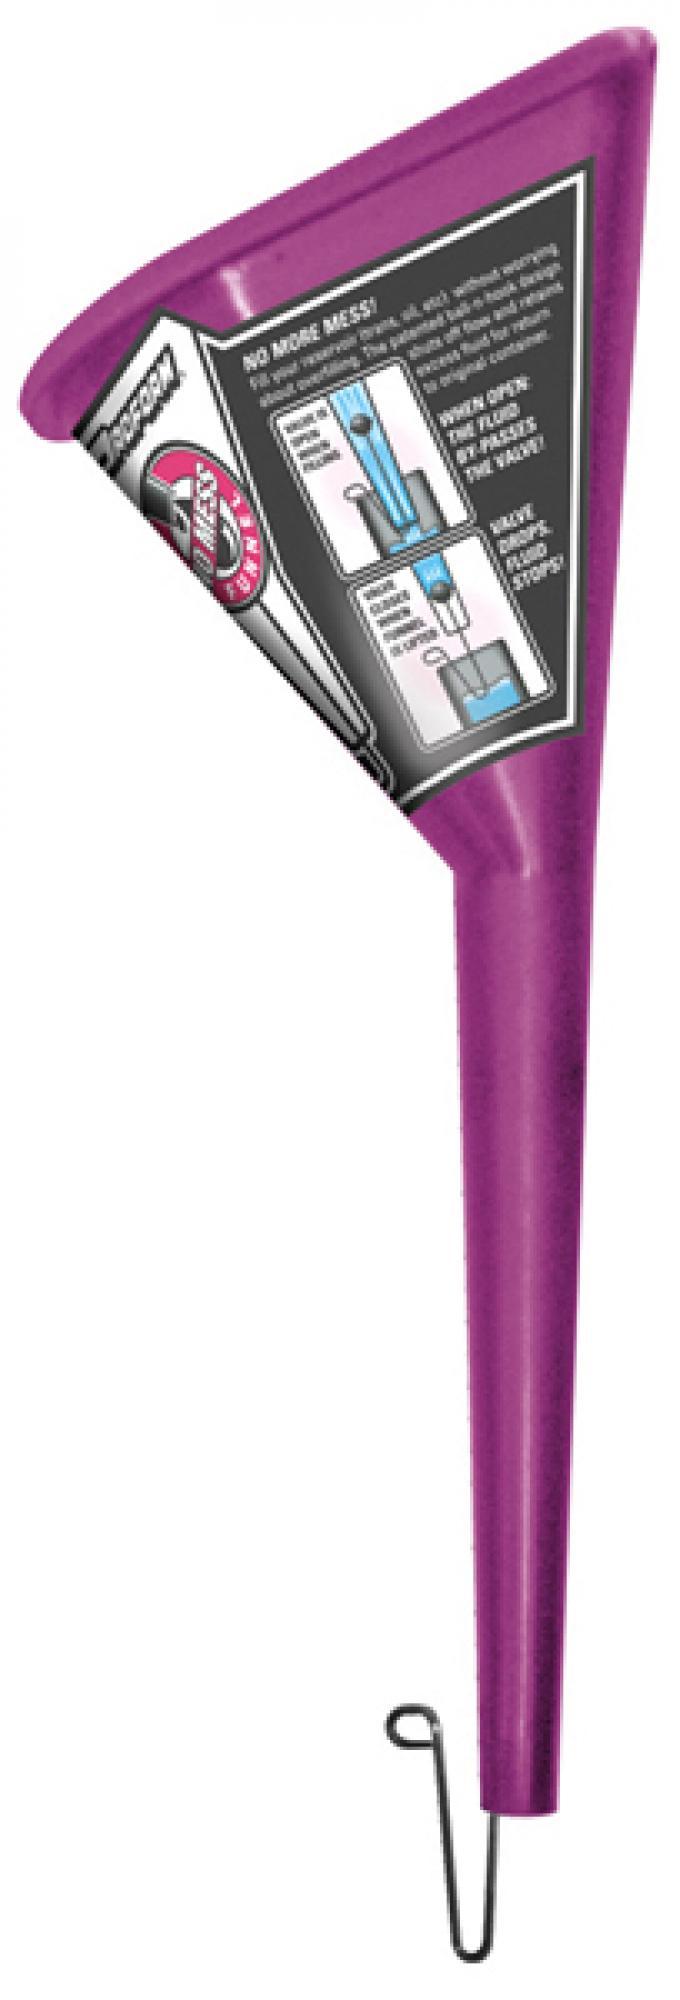 Proform Funnel, Proform No-Mess Model, Purple, Patented Design, Sold Each 68068